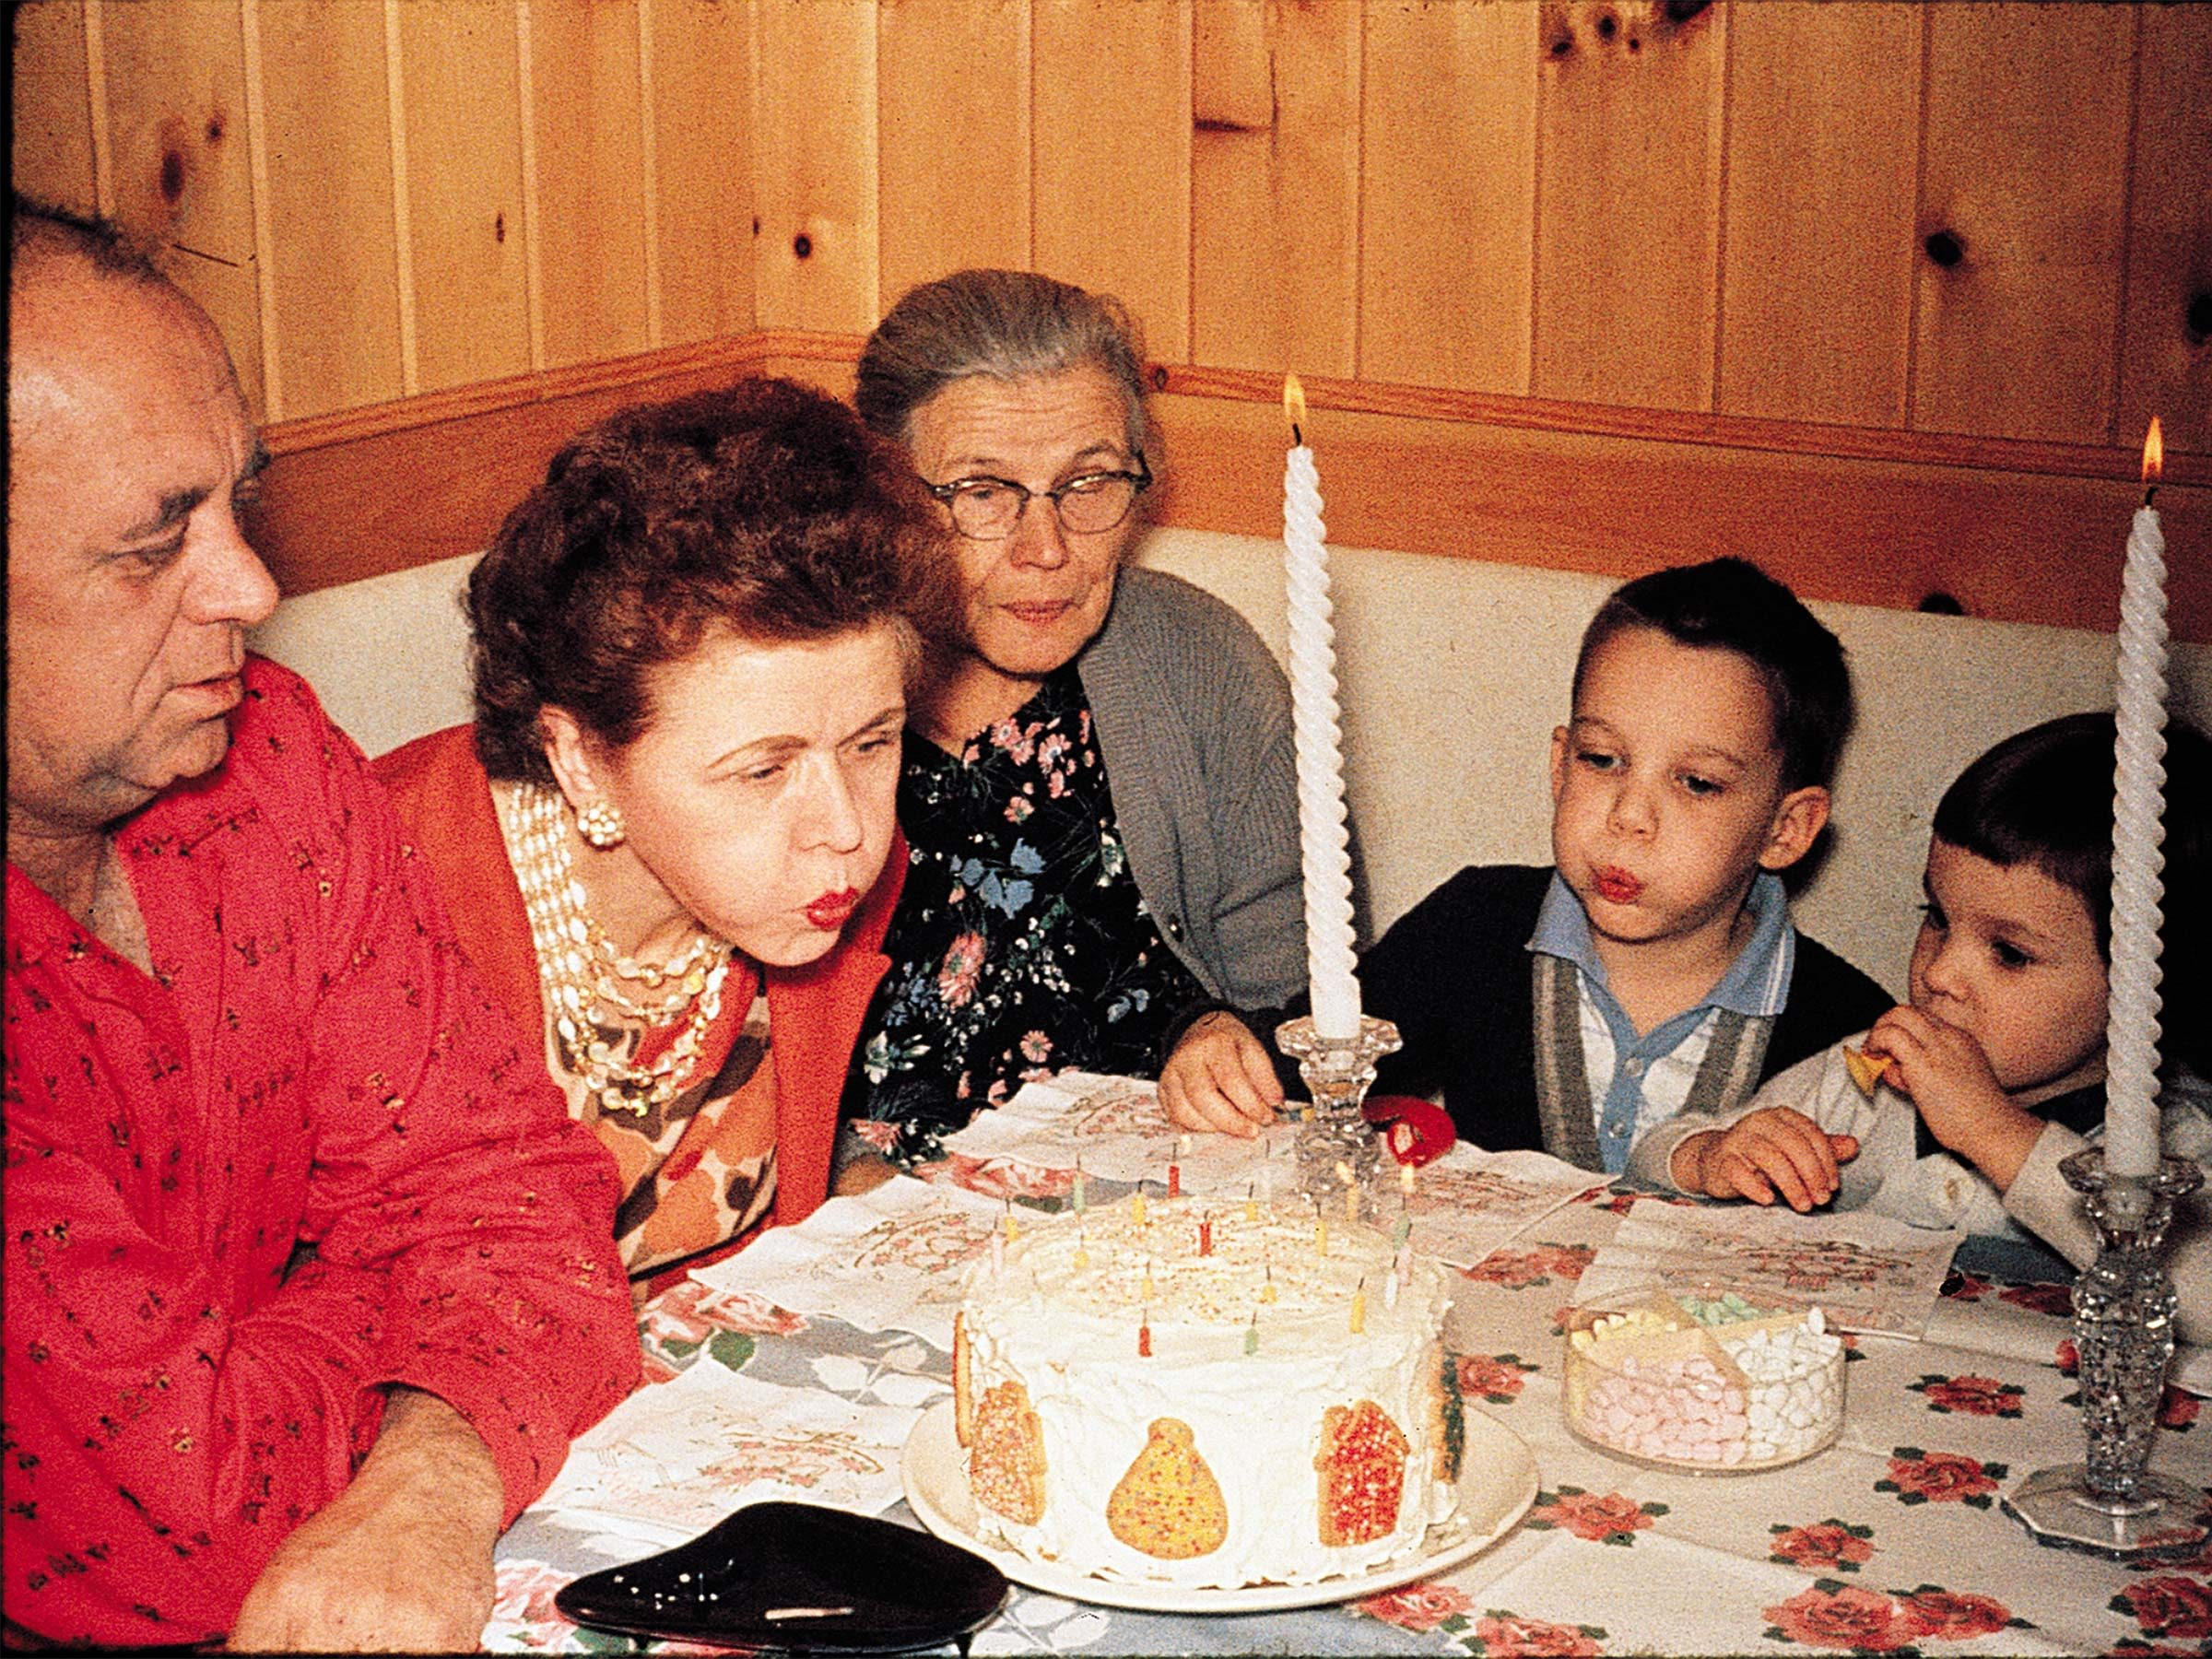 vintage birthday party